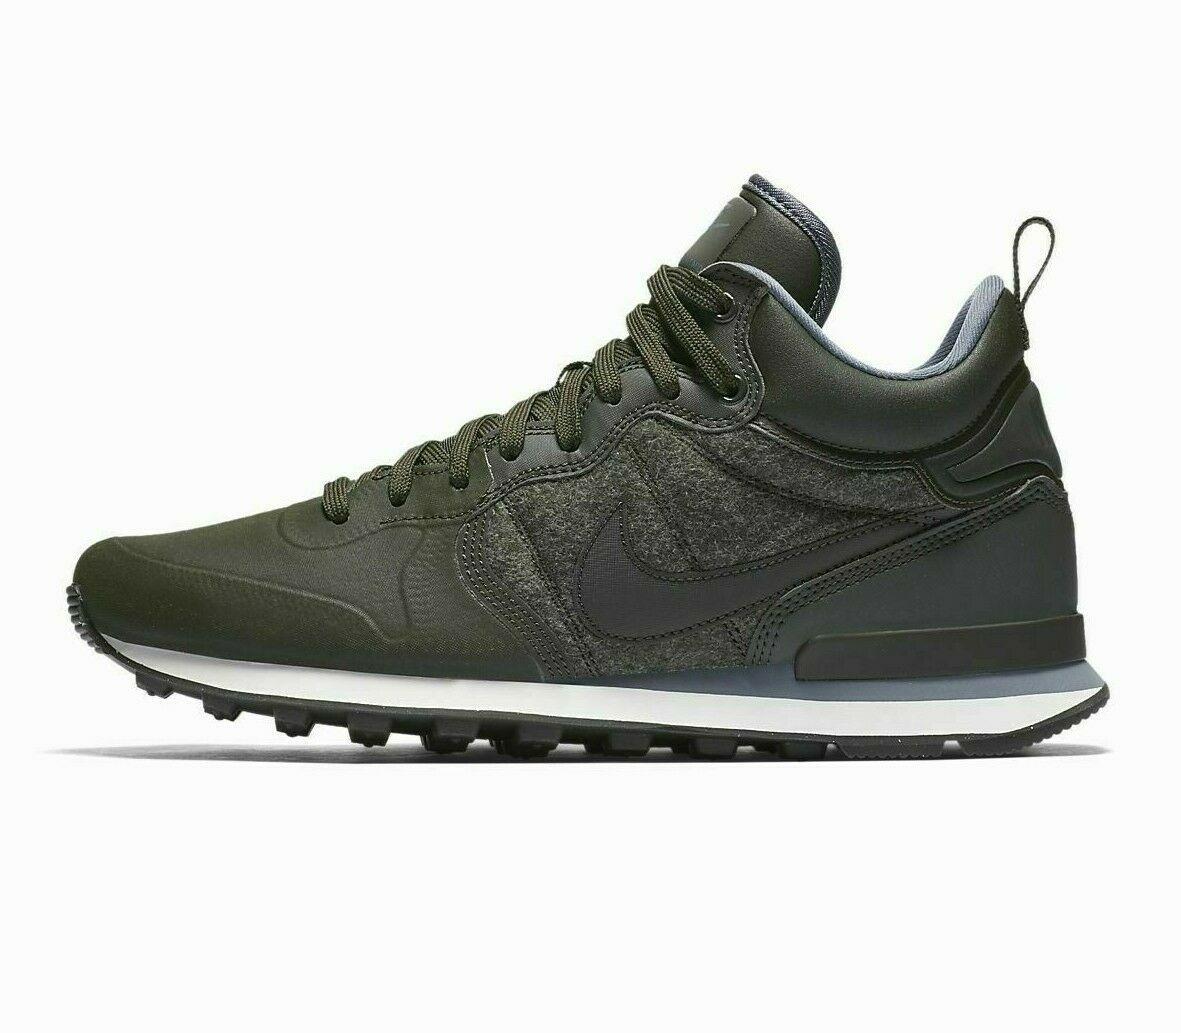 newest a863b 2055d Nike Internationalist Utility Sequoia Velvet Brown 857937 301 Mens Shoes